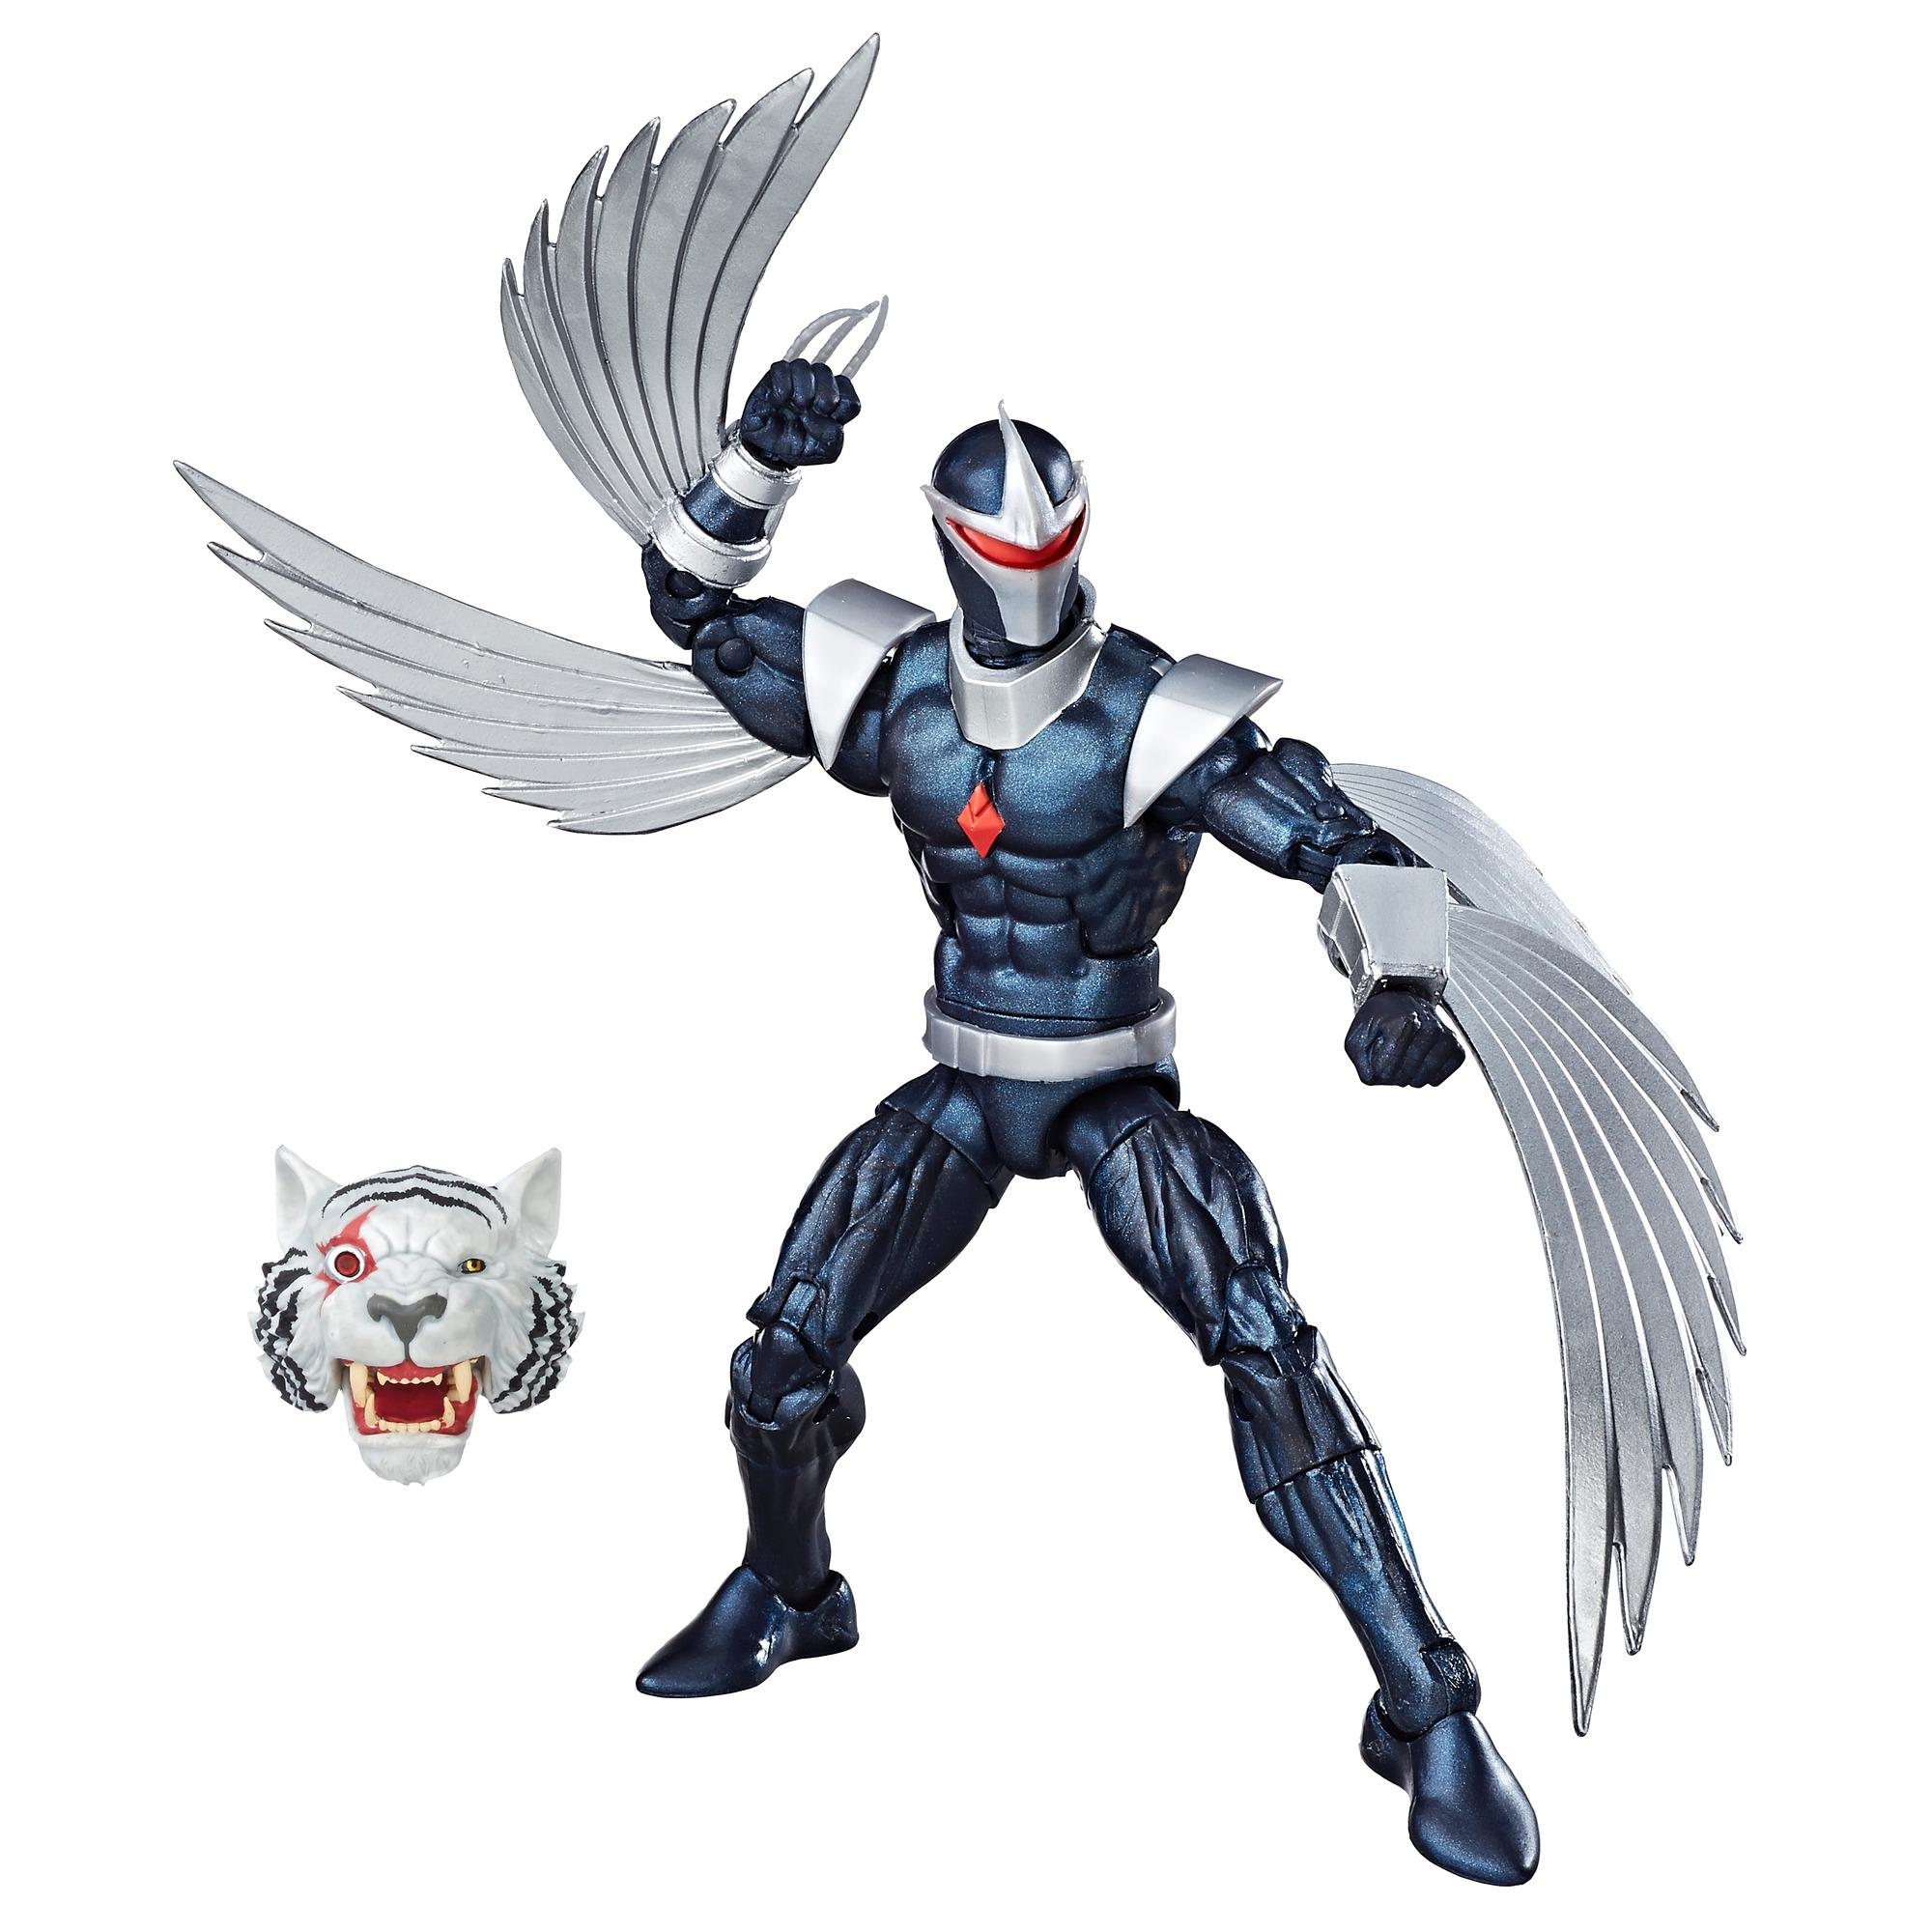 Marvel Guardians of the Galaxy 6-inch Legends Series Darkhawk